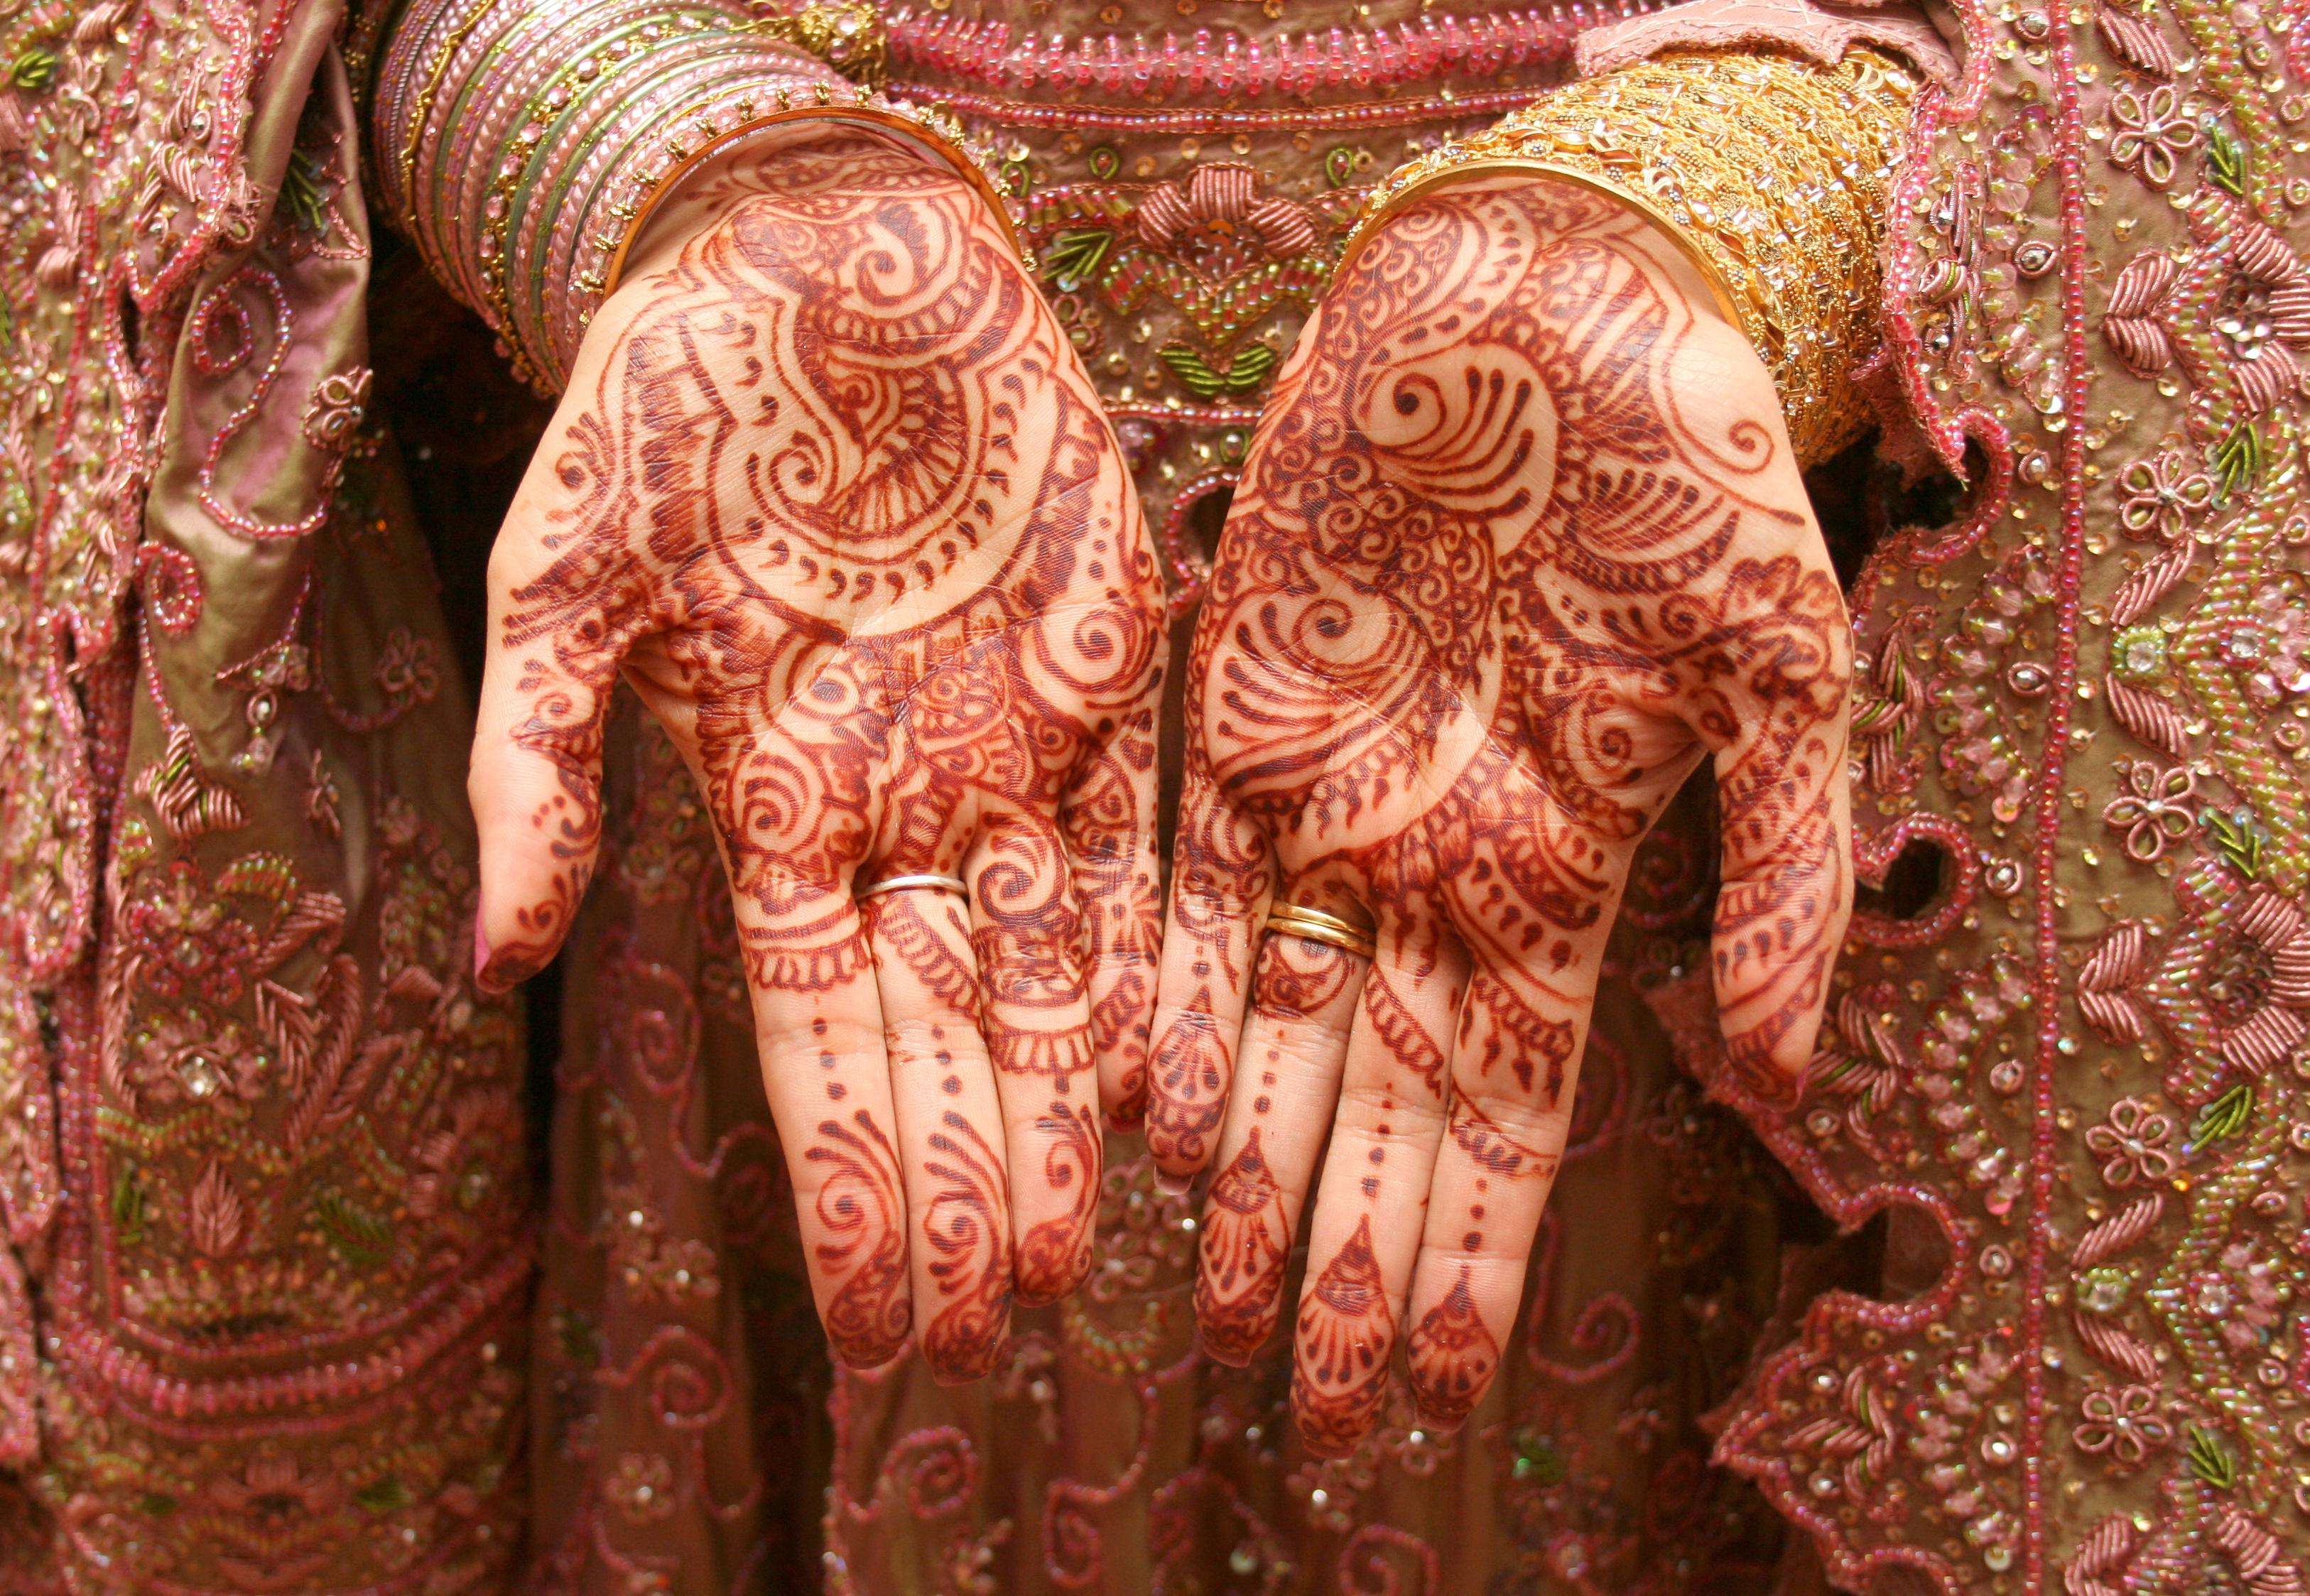 Free Henna Designs | Lovetoknow - Free Printable Henna Tattoo Designs